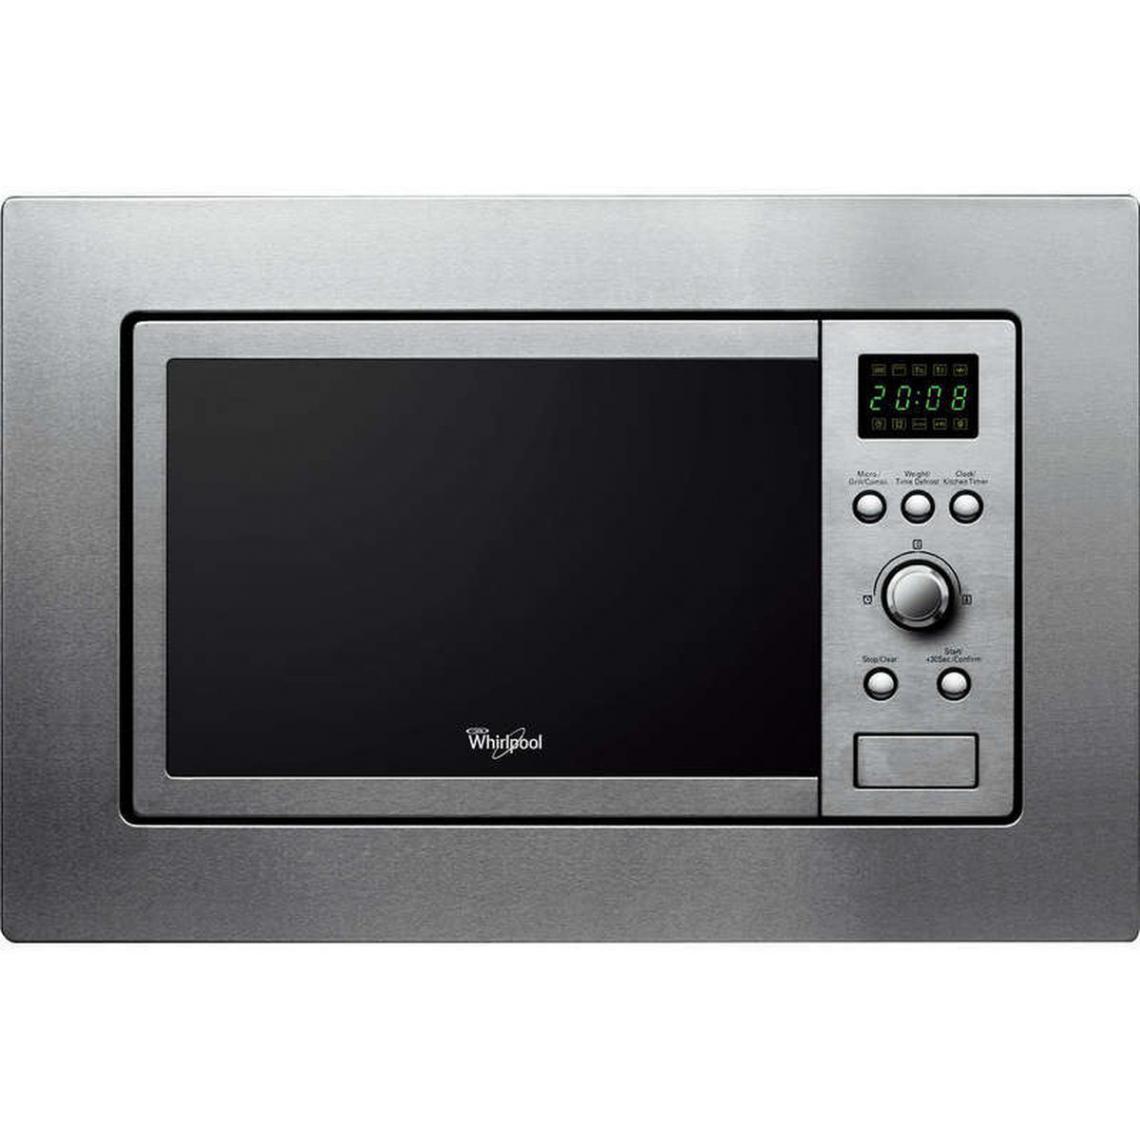 Whirlpool Micro-ondes Grill encastrable 800W - AMW 140 IX - Inox